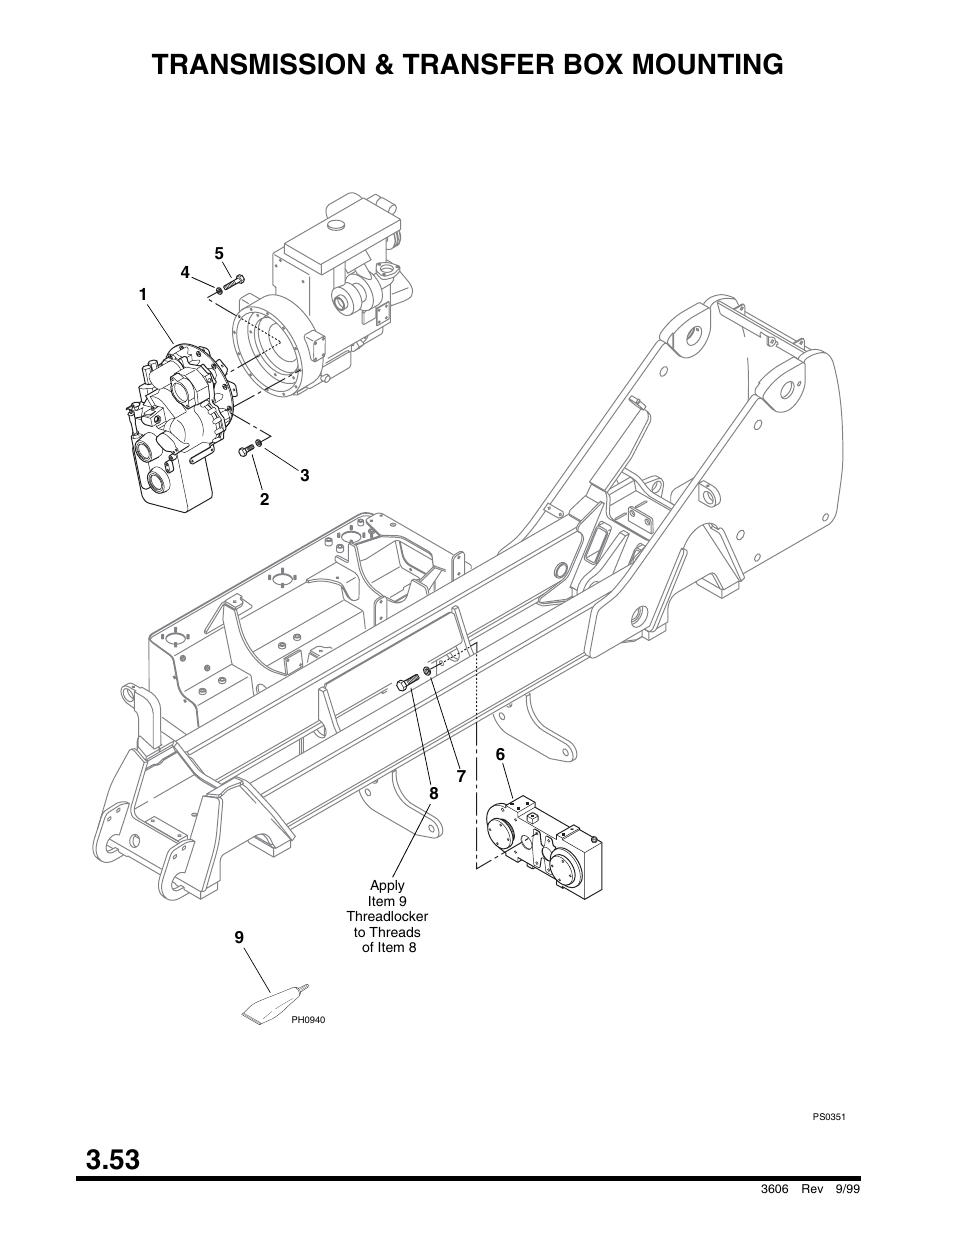 Transmission & transfer box mounting, Brake assembly